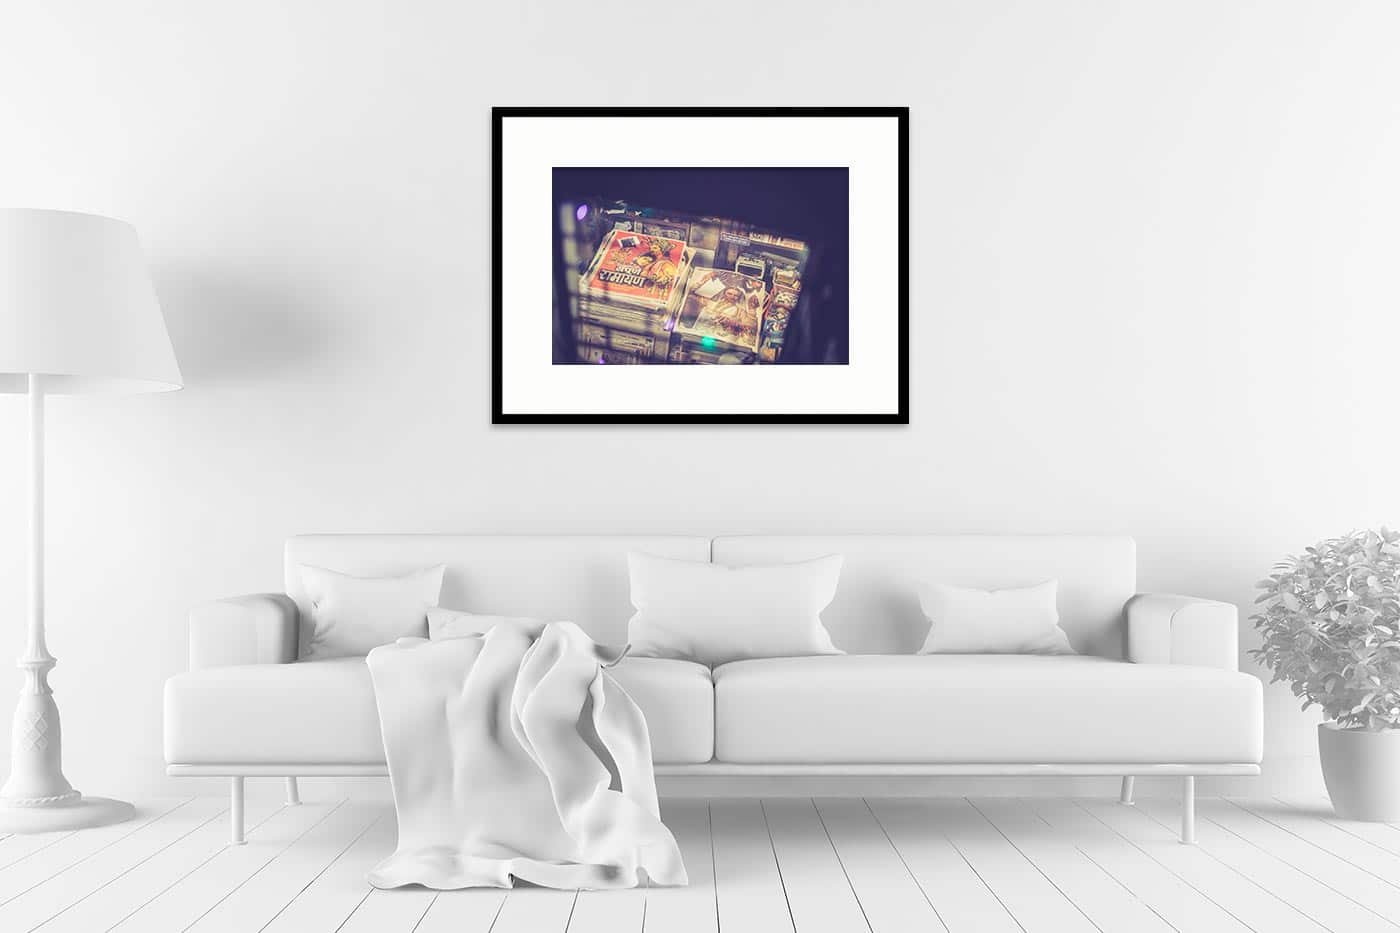 Cadre galerie 60x80 Bollywood